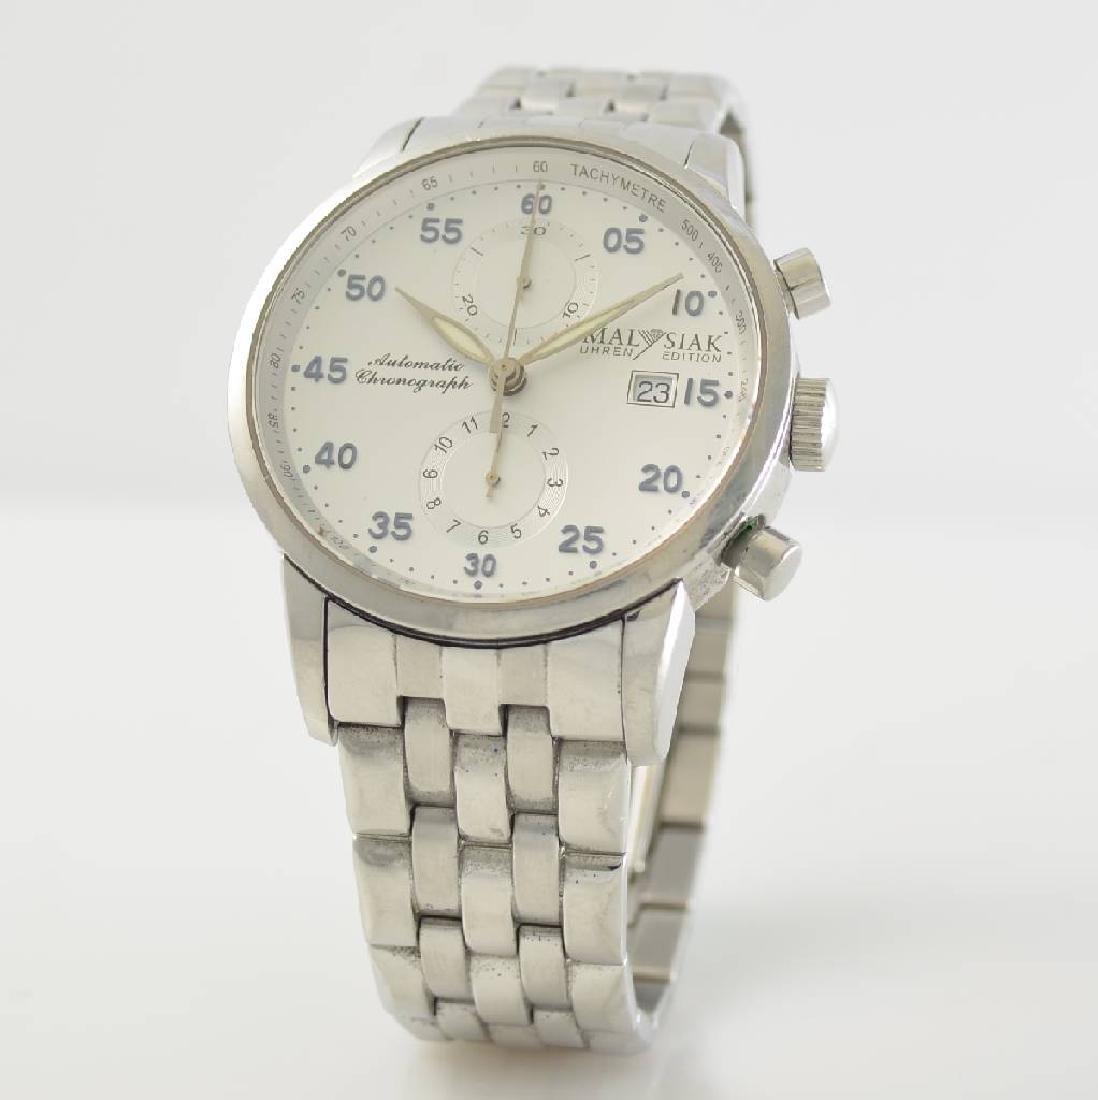 MALYSIAK Uhren Edition self winding chronograph - 3